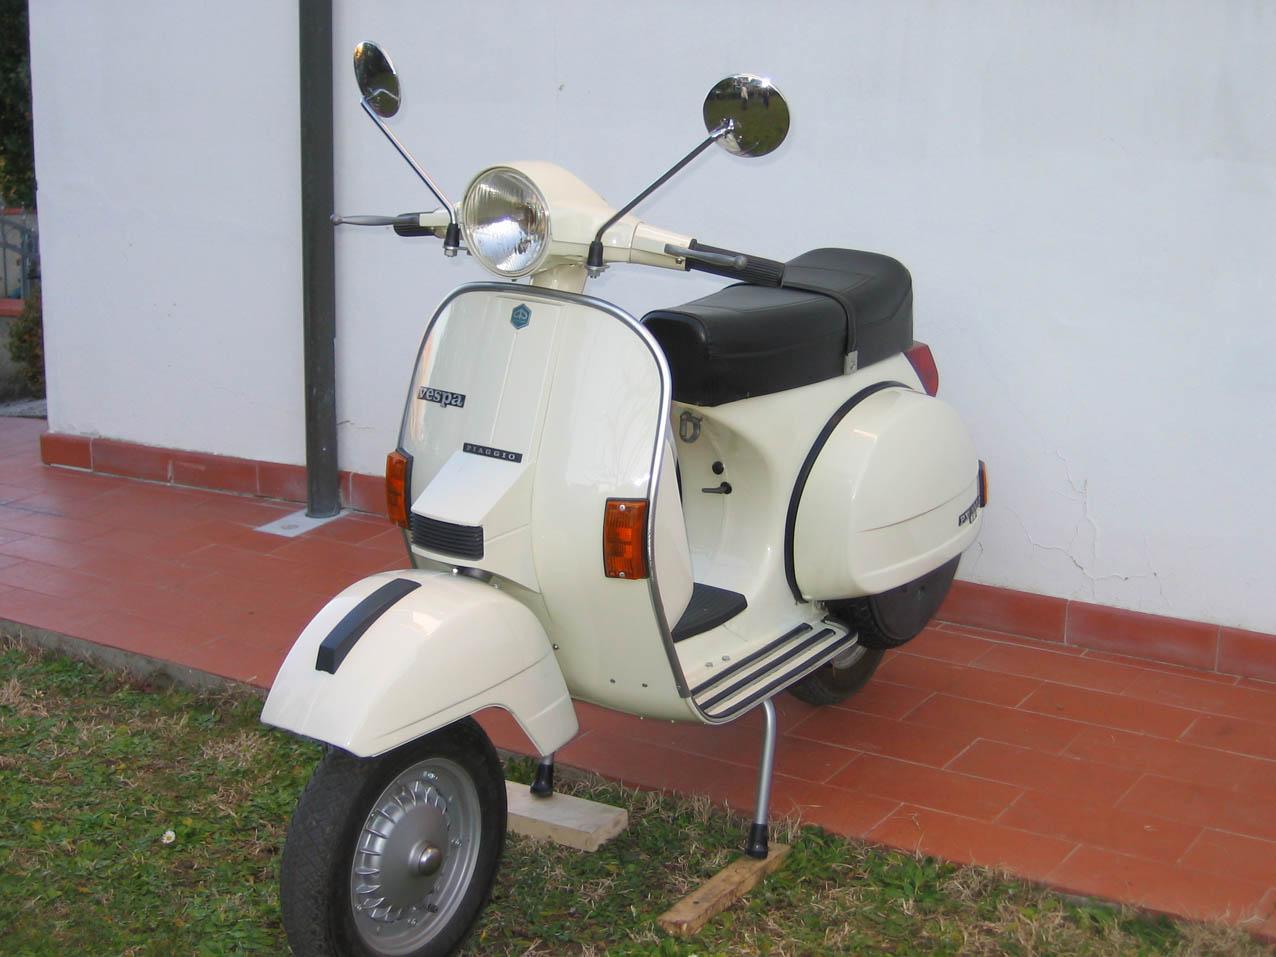 Vespa Px 200 E Arcobaleno 197cc Di Matteo 94 Ciao Cross Club